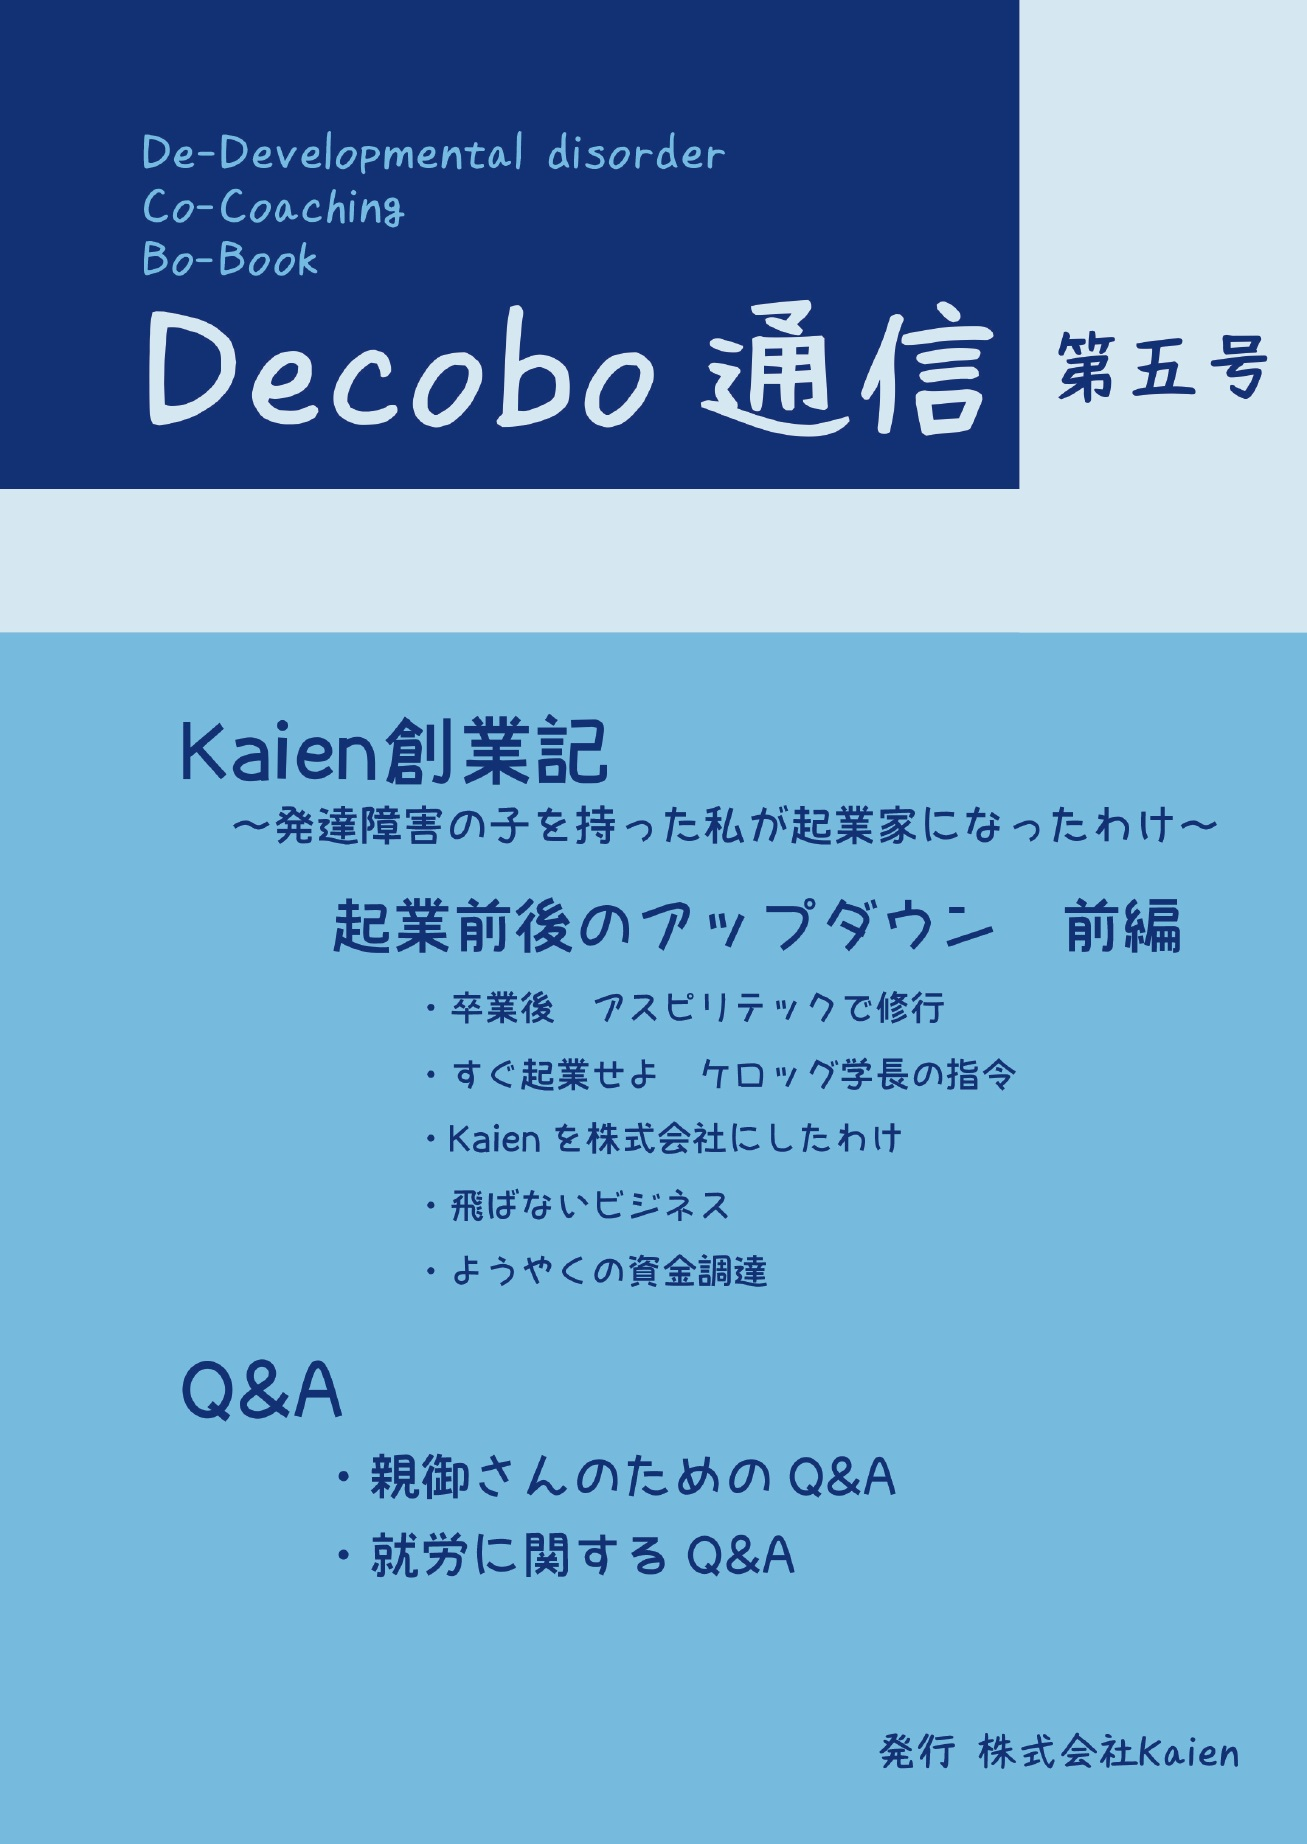 decobo通信第5号表紙